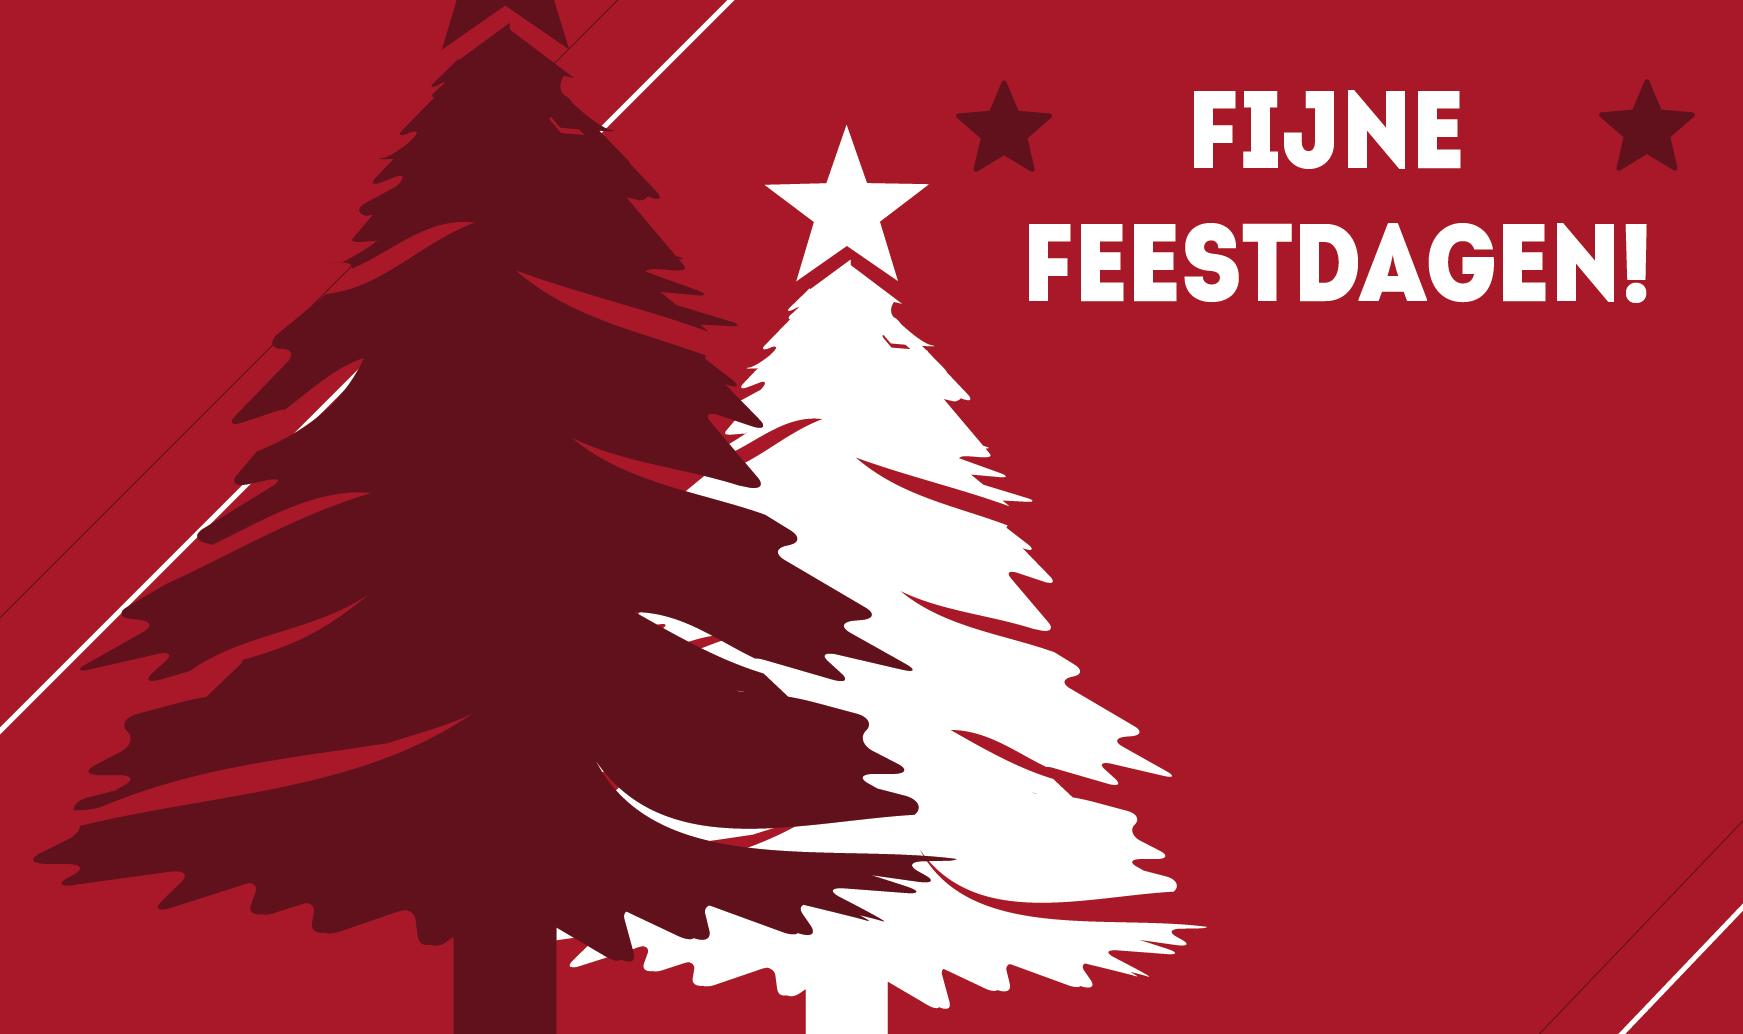 Fijne feestdagen_ Gacom communication and security